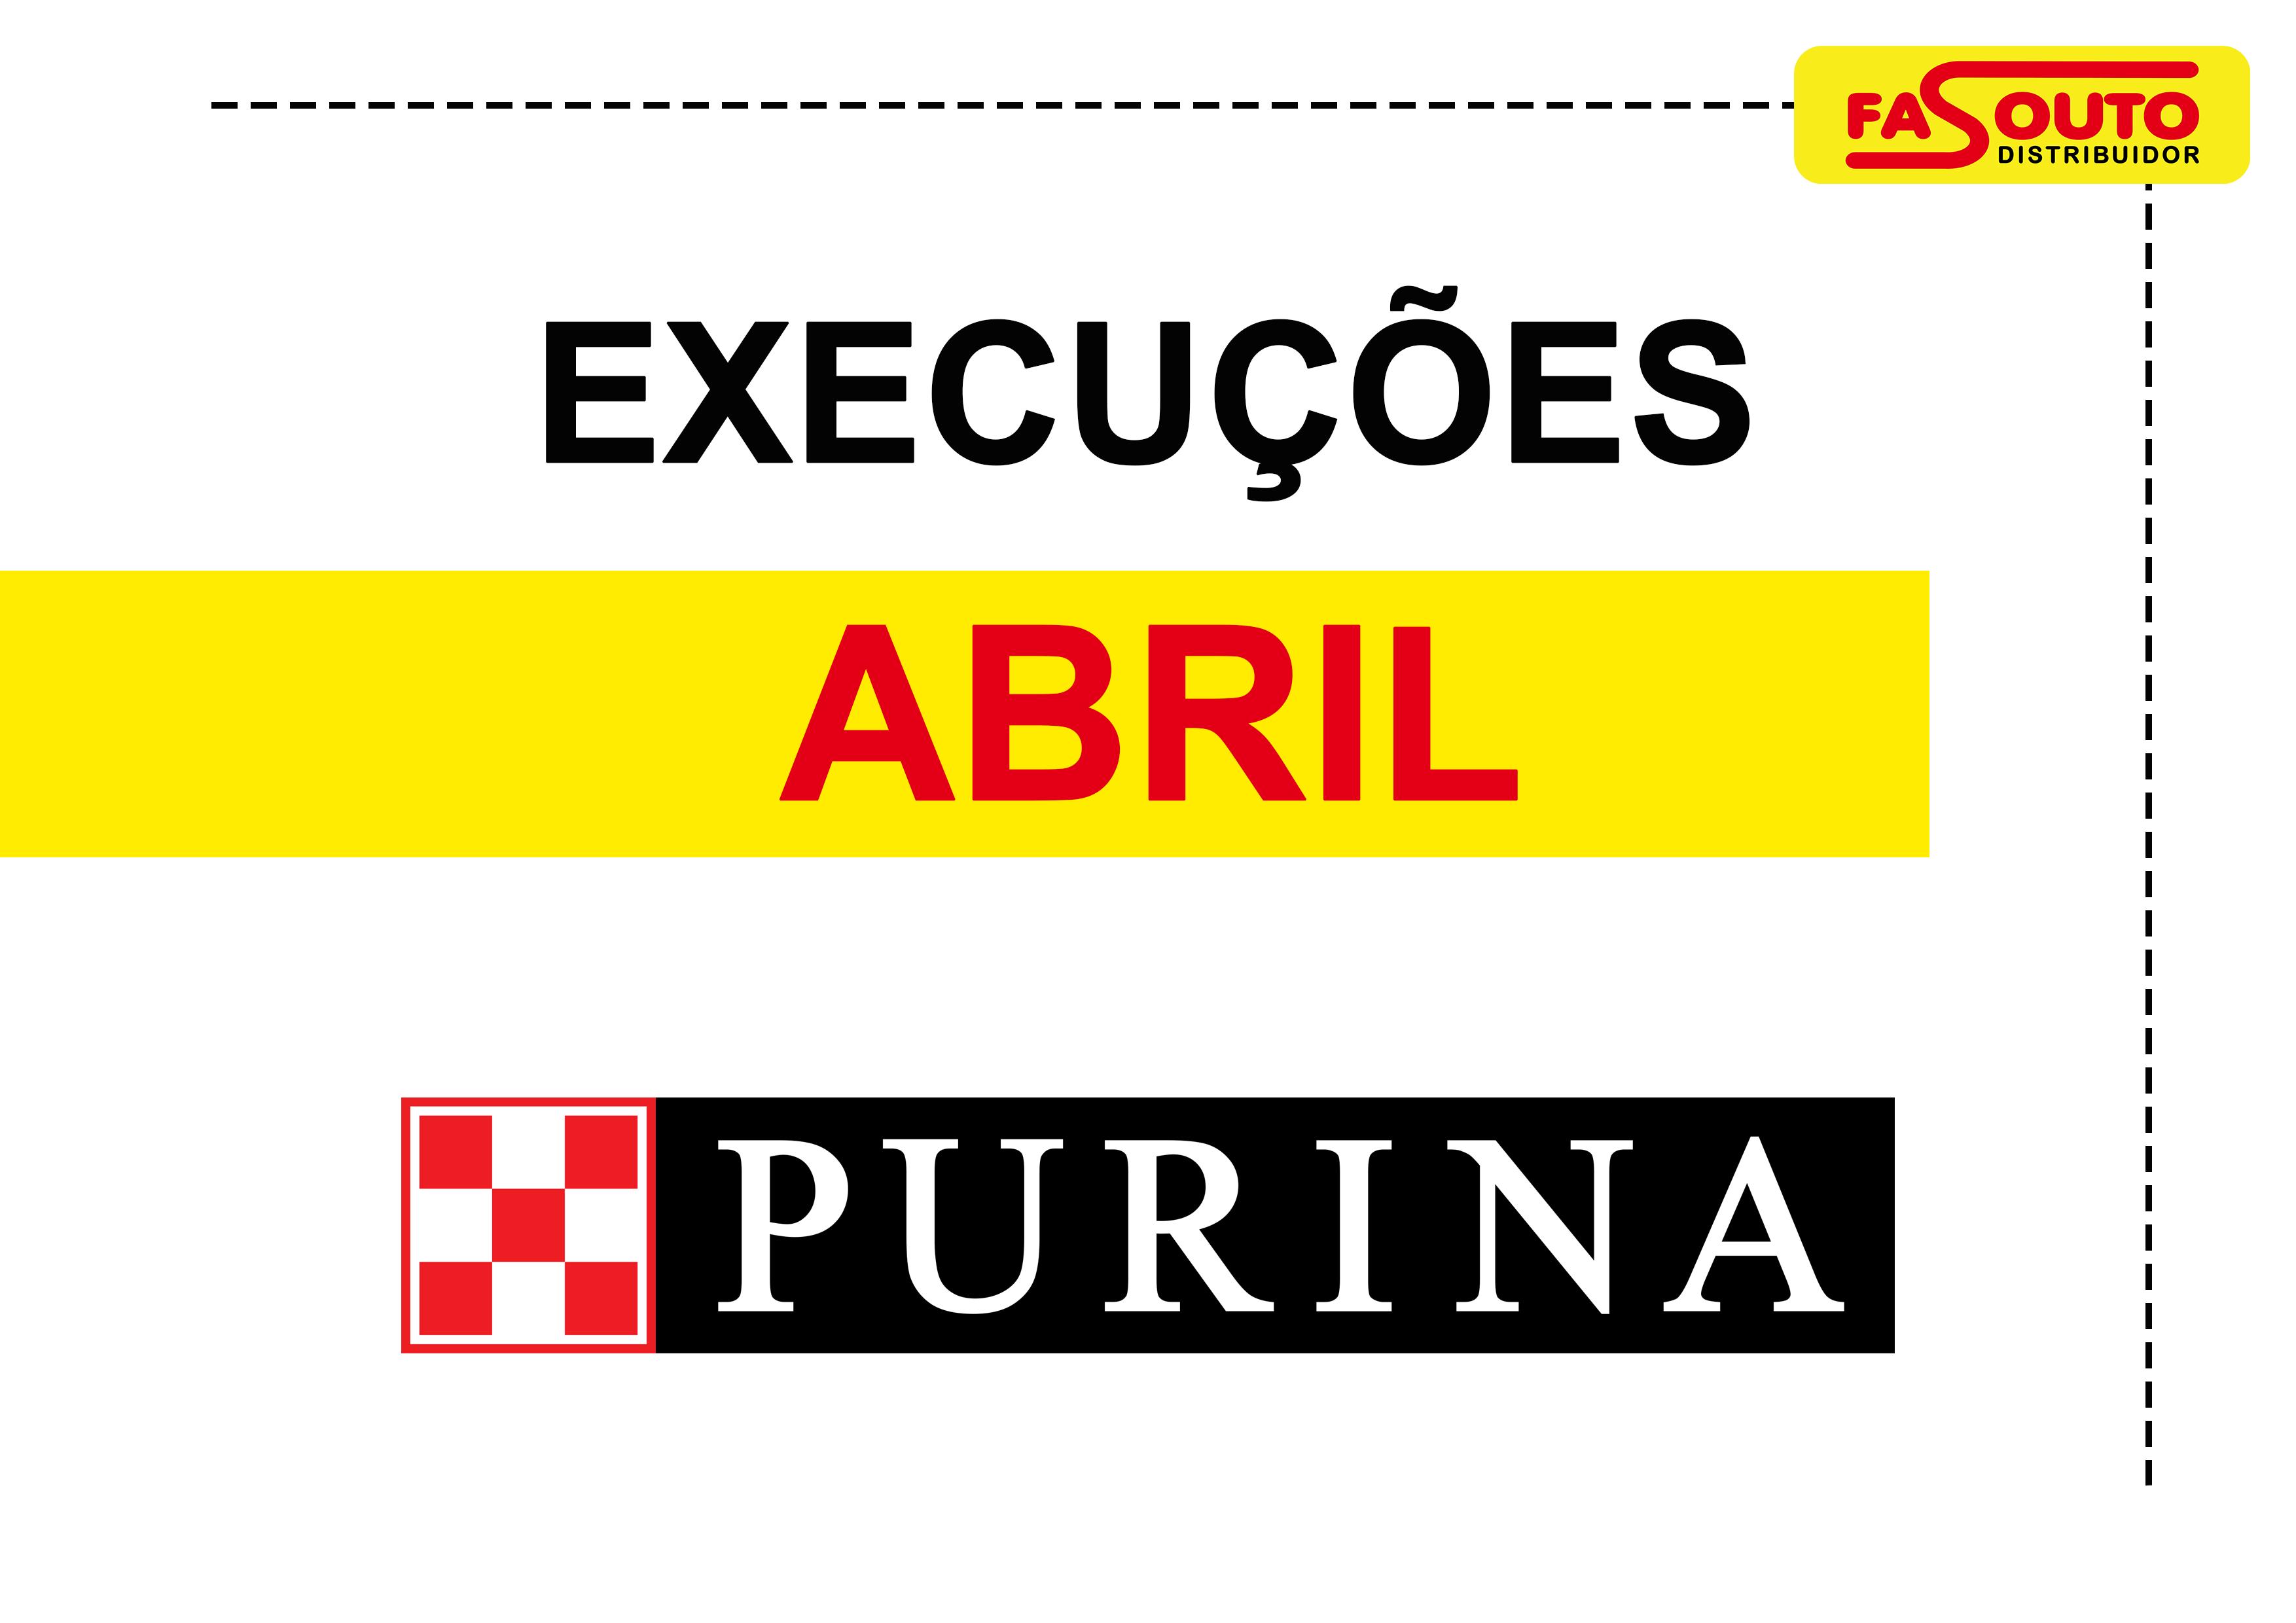 Purina - Abril 2019